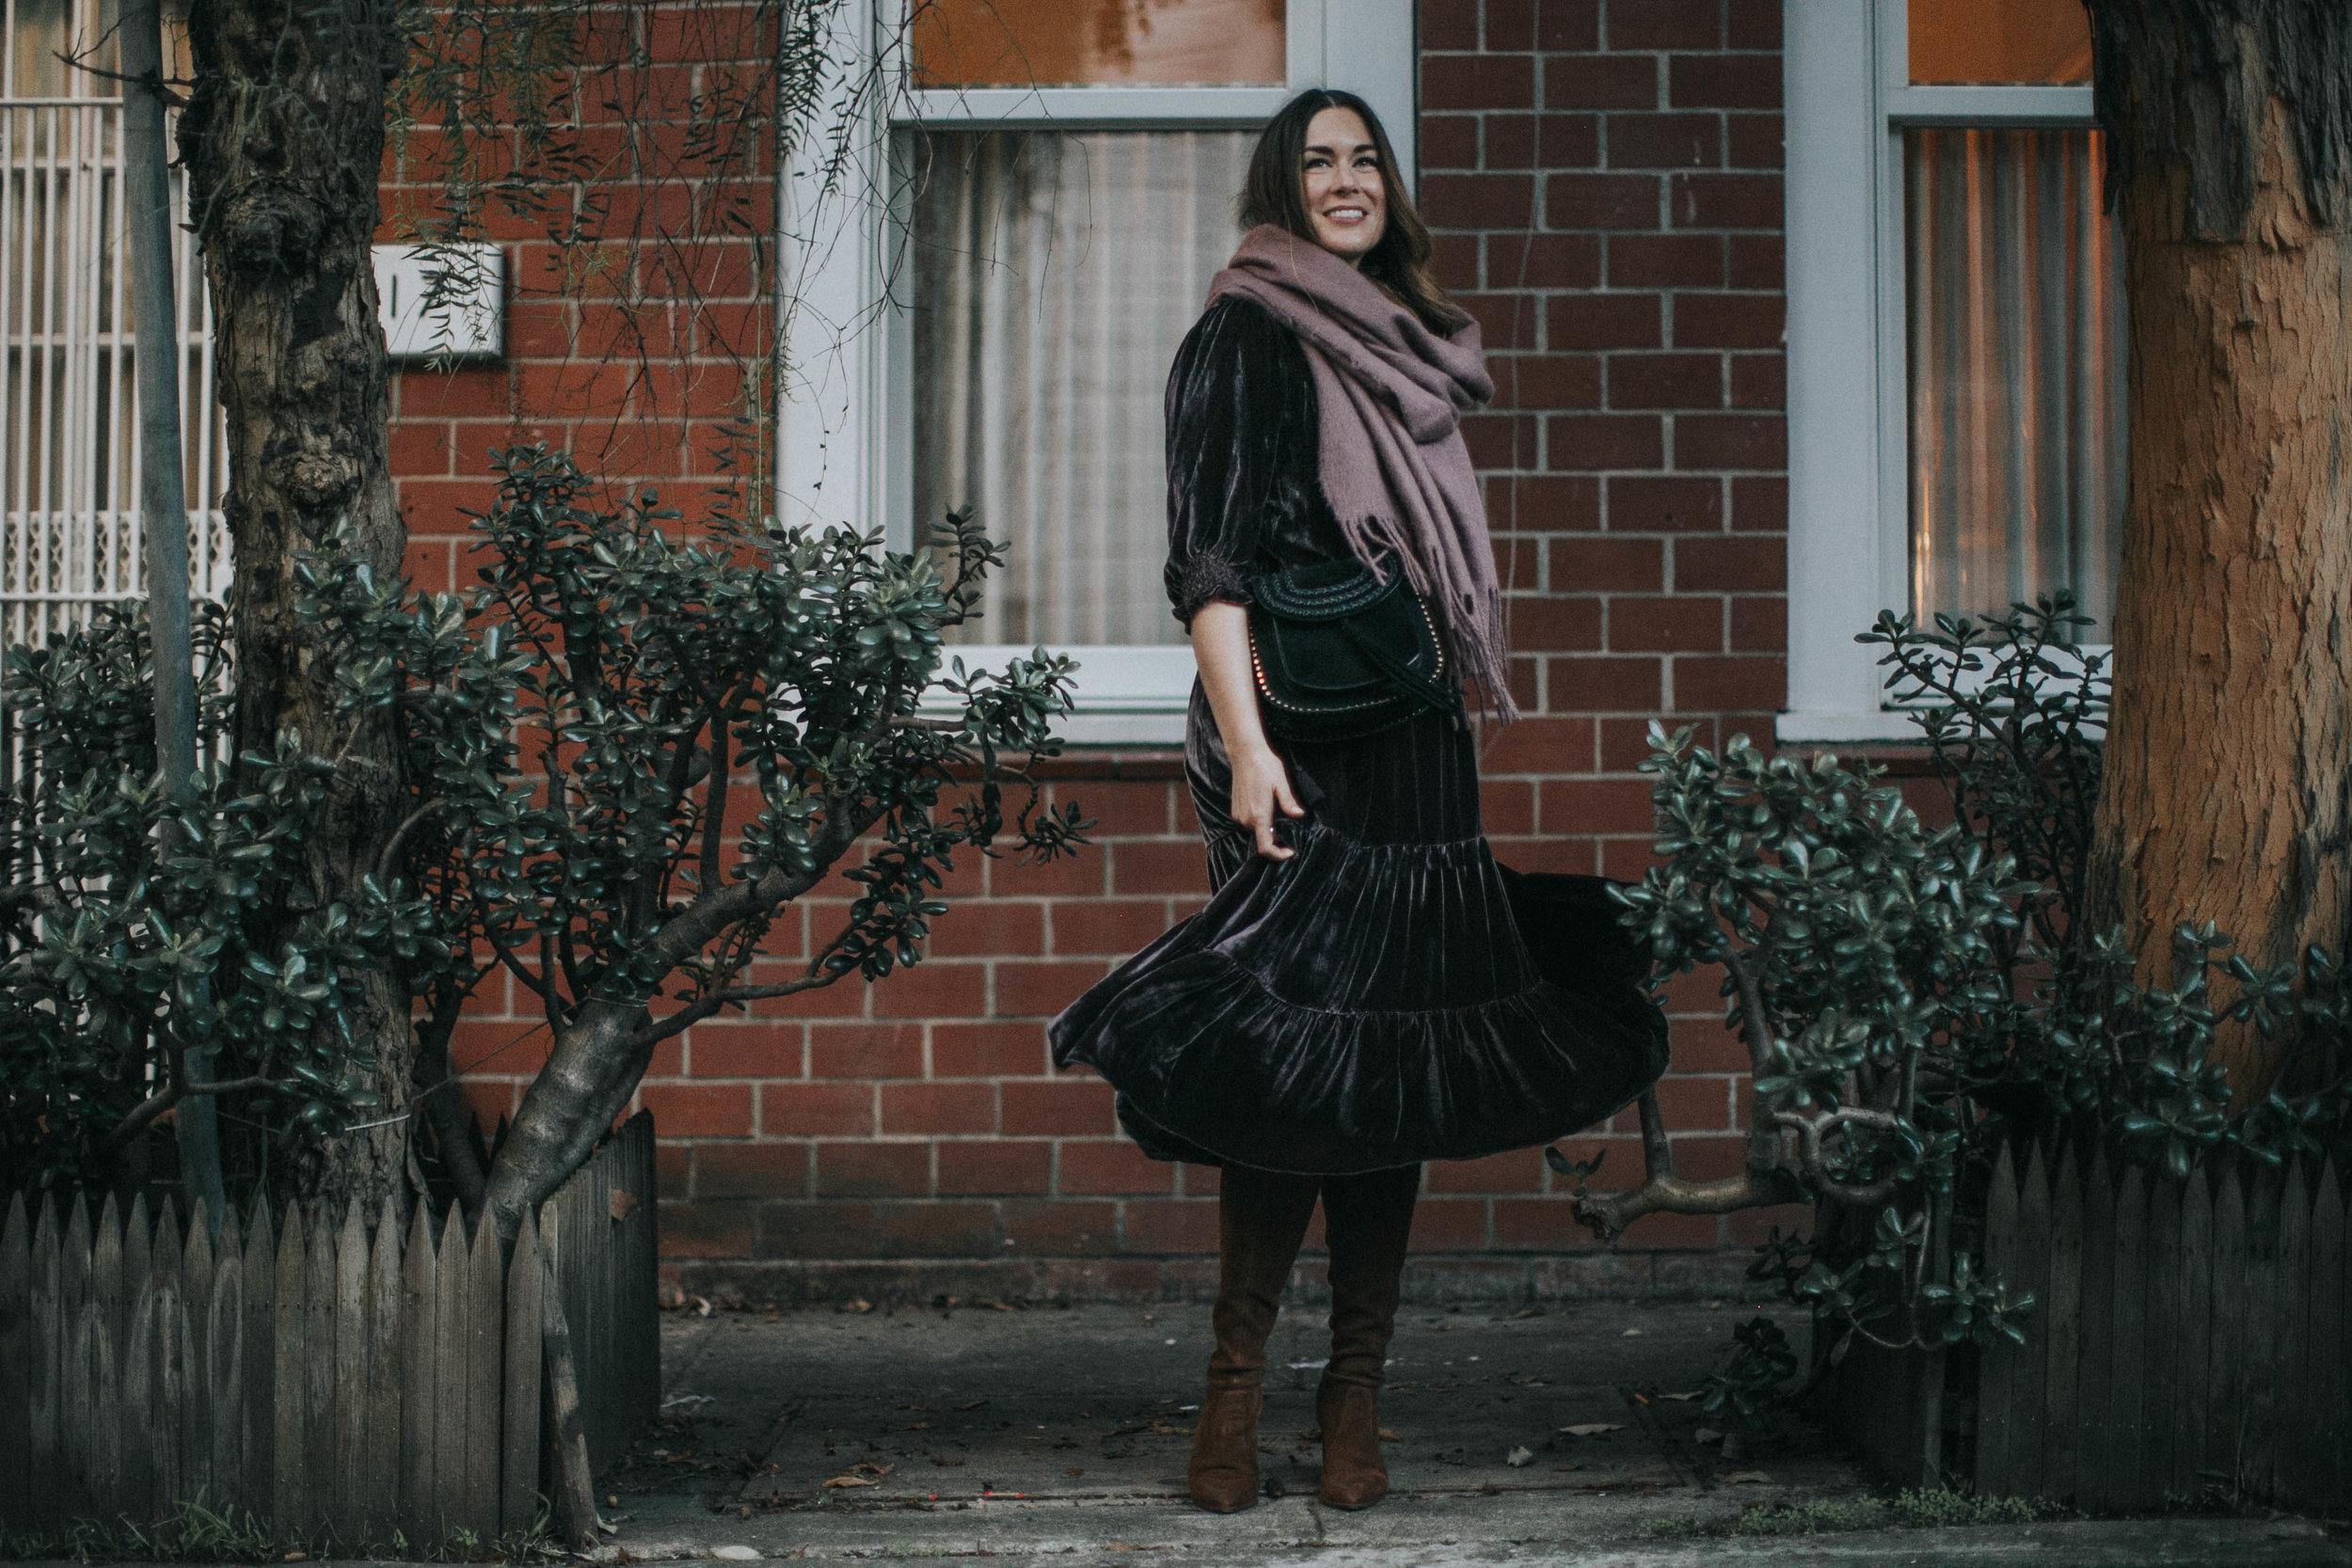 purse  Chloé  | sunglasses  Karen Walker  | scarf  ASOS  | dress  Ulla Johnson